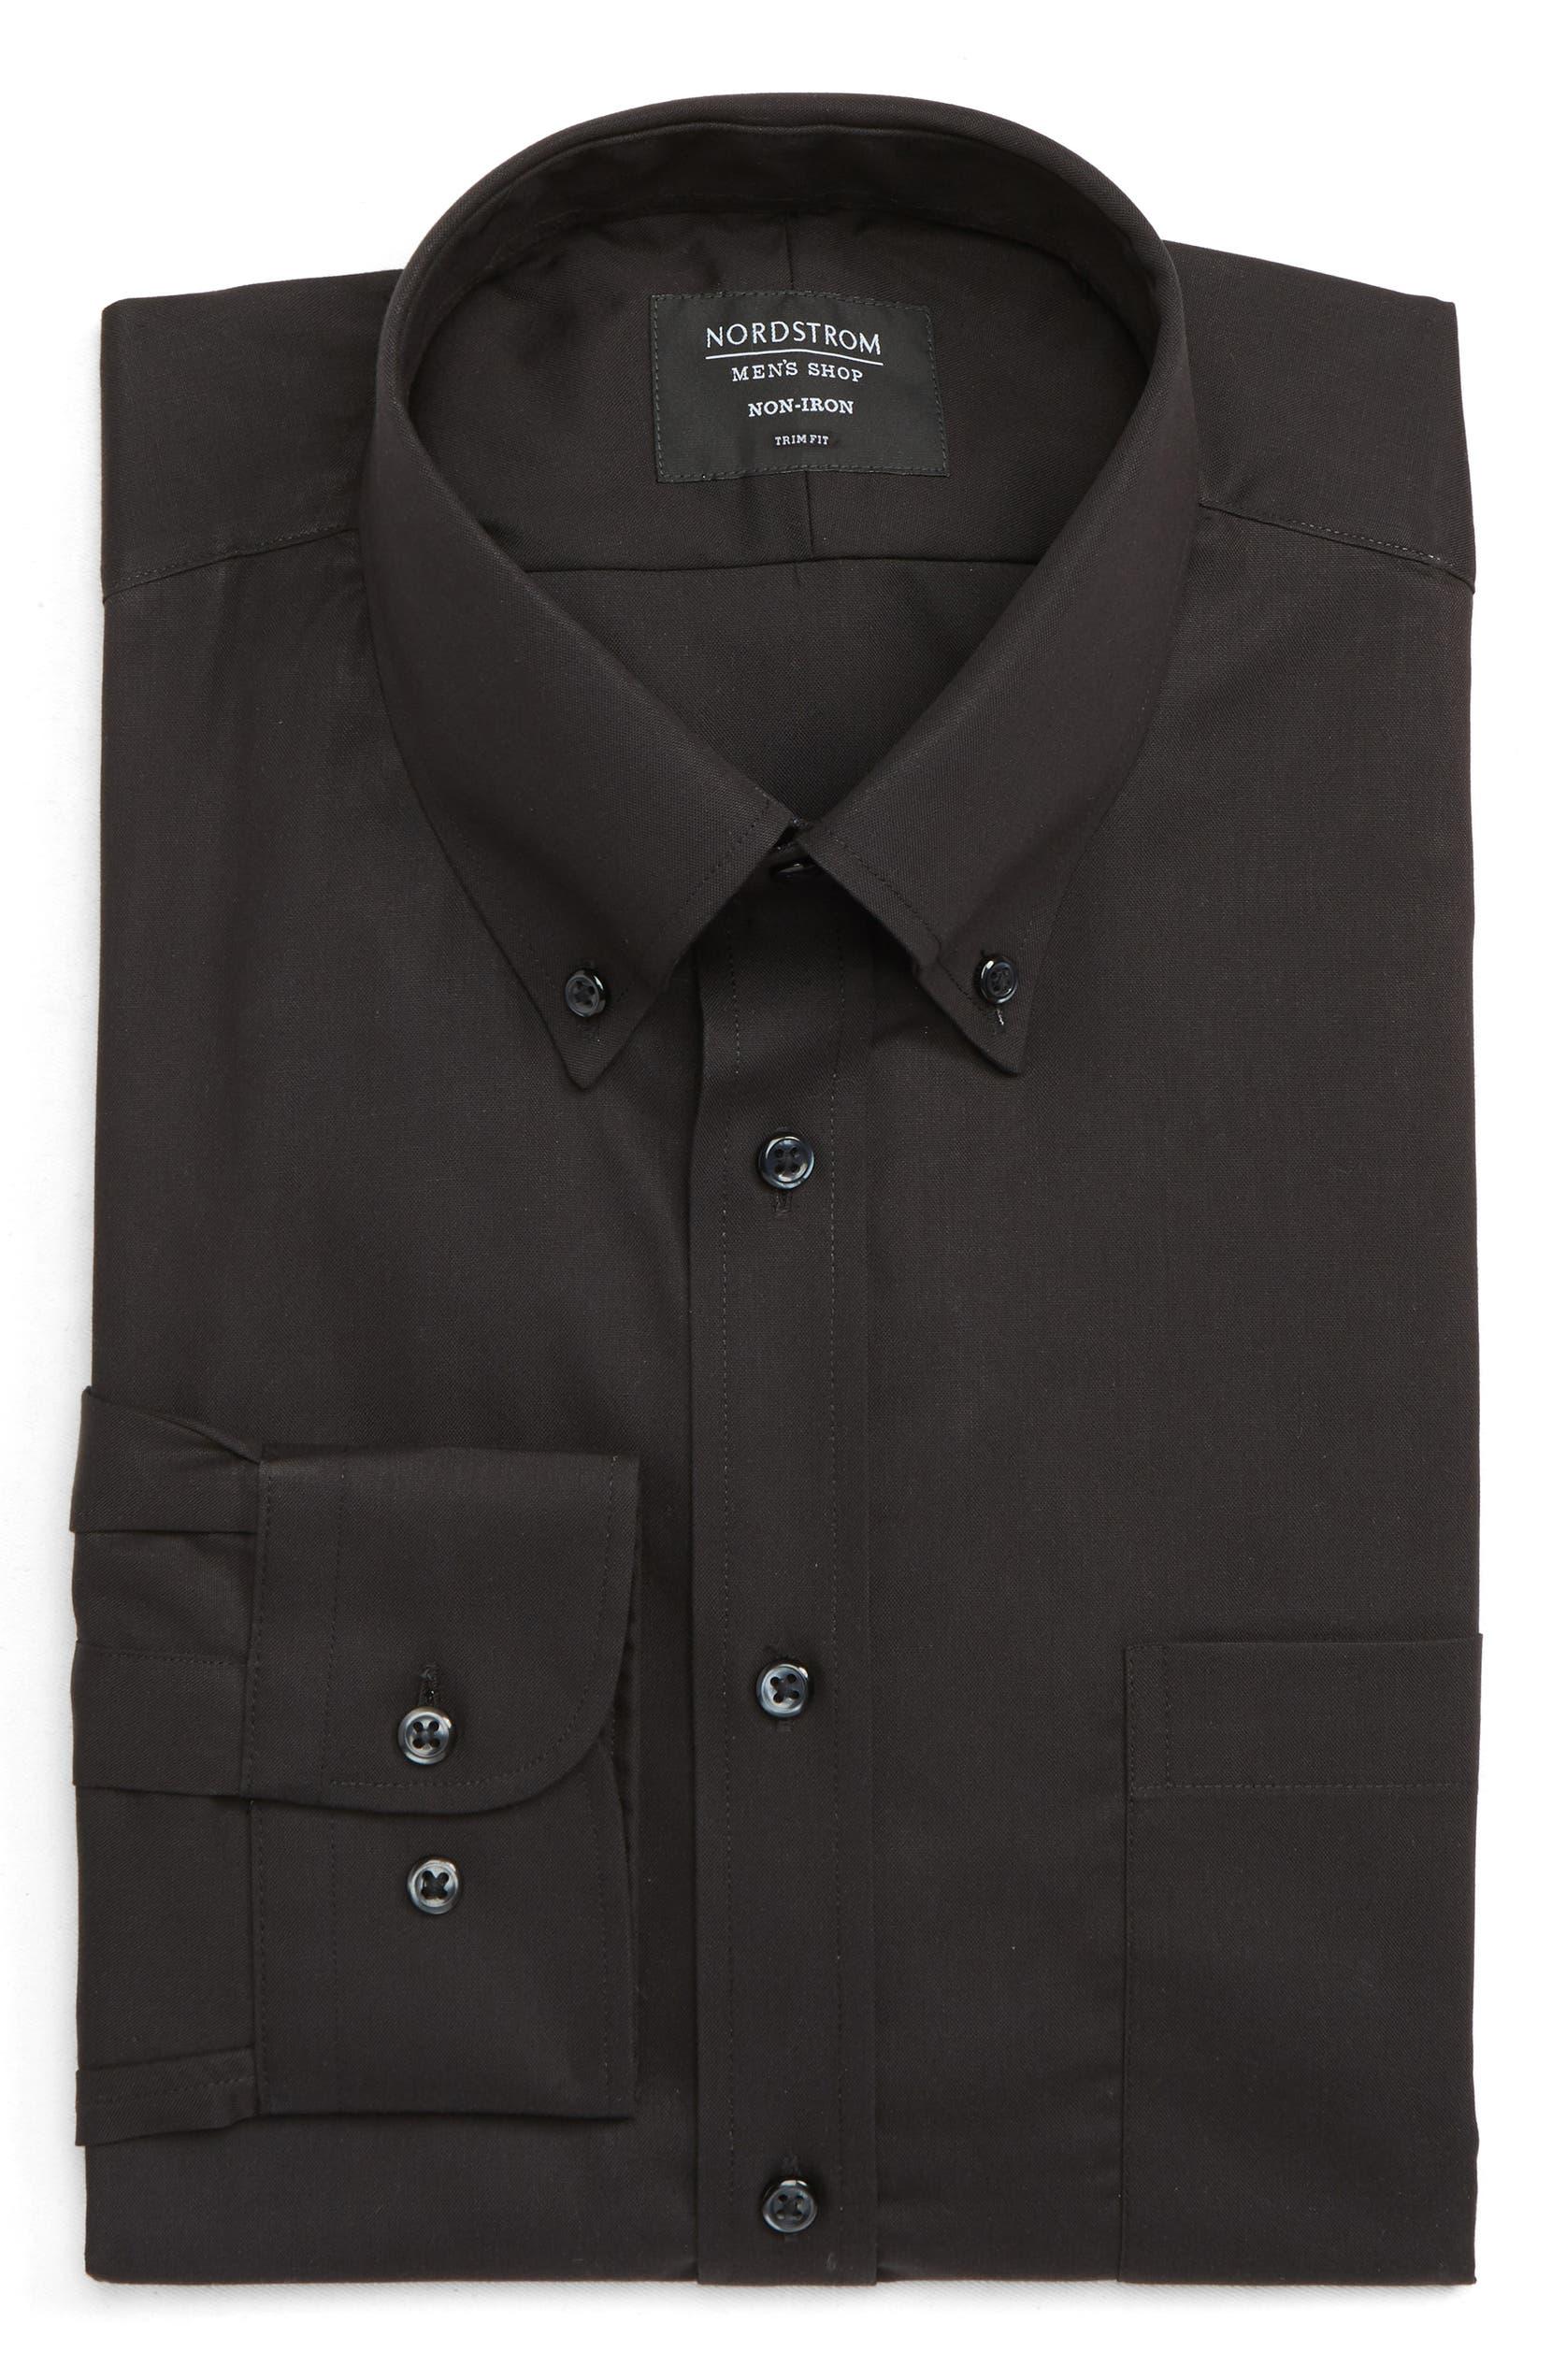 Nordstrom Mens Shop Trim Fit Non Iron Dress Shirt Nordstrom